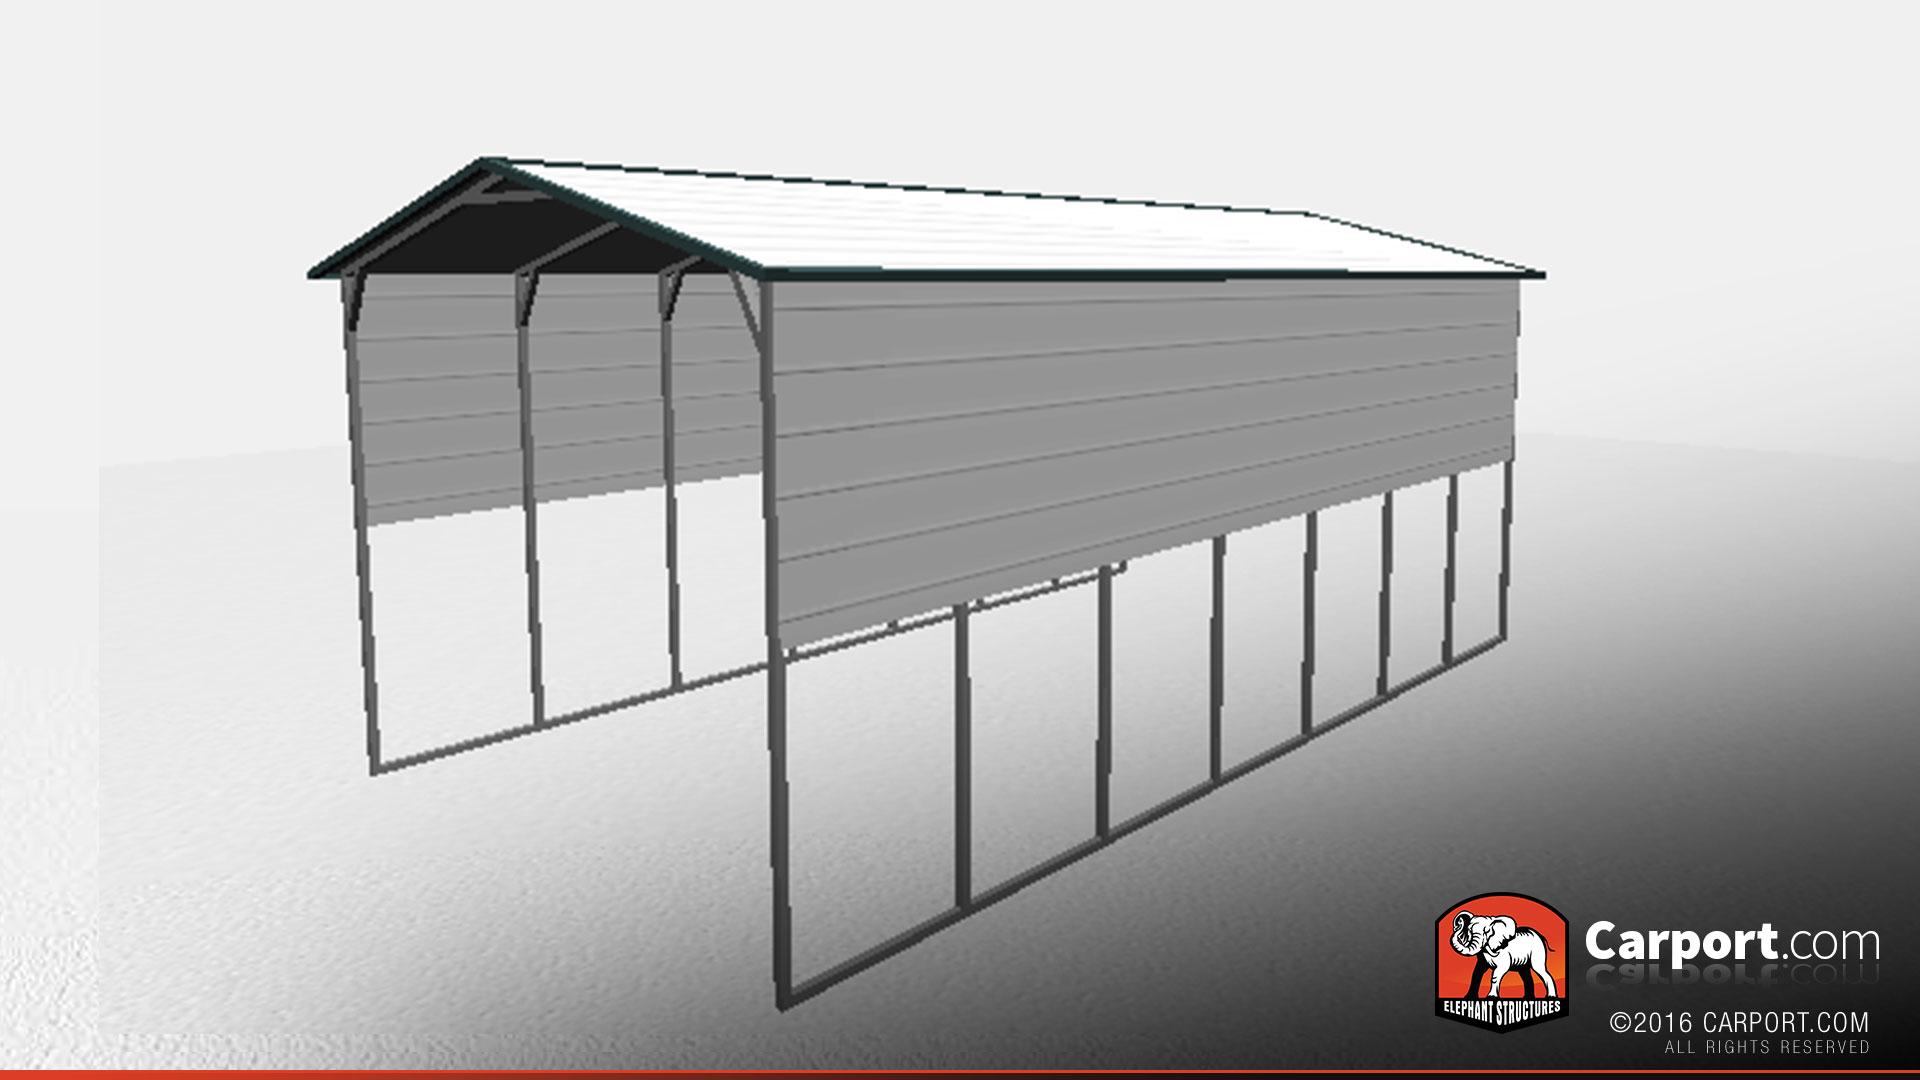 16 X 30 X 12 Rv Carport With Extra Panels Rv Carports